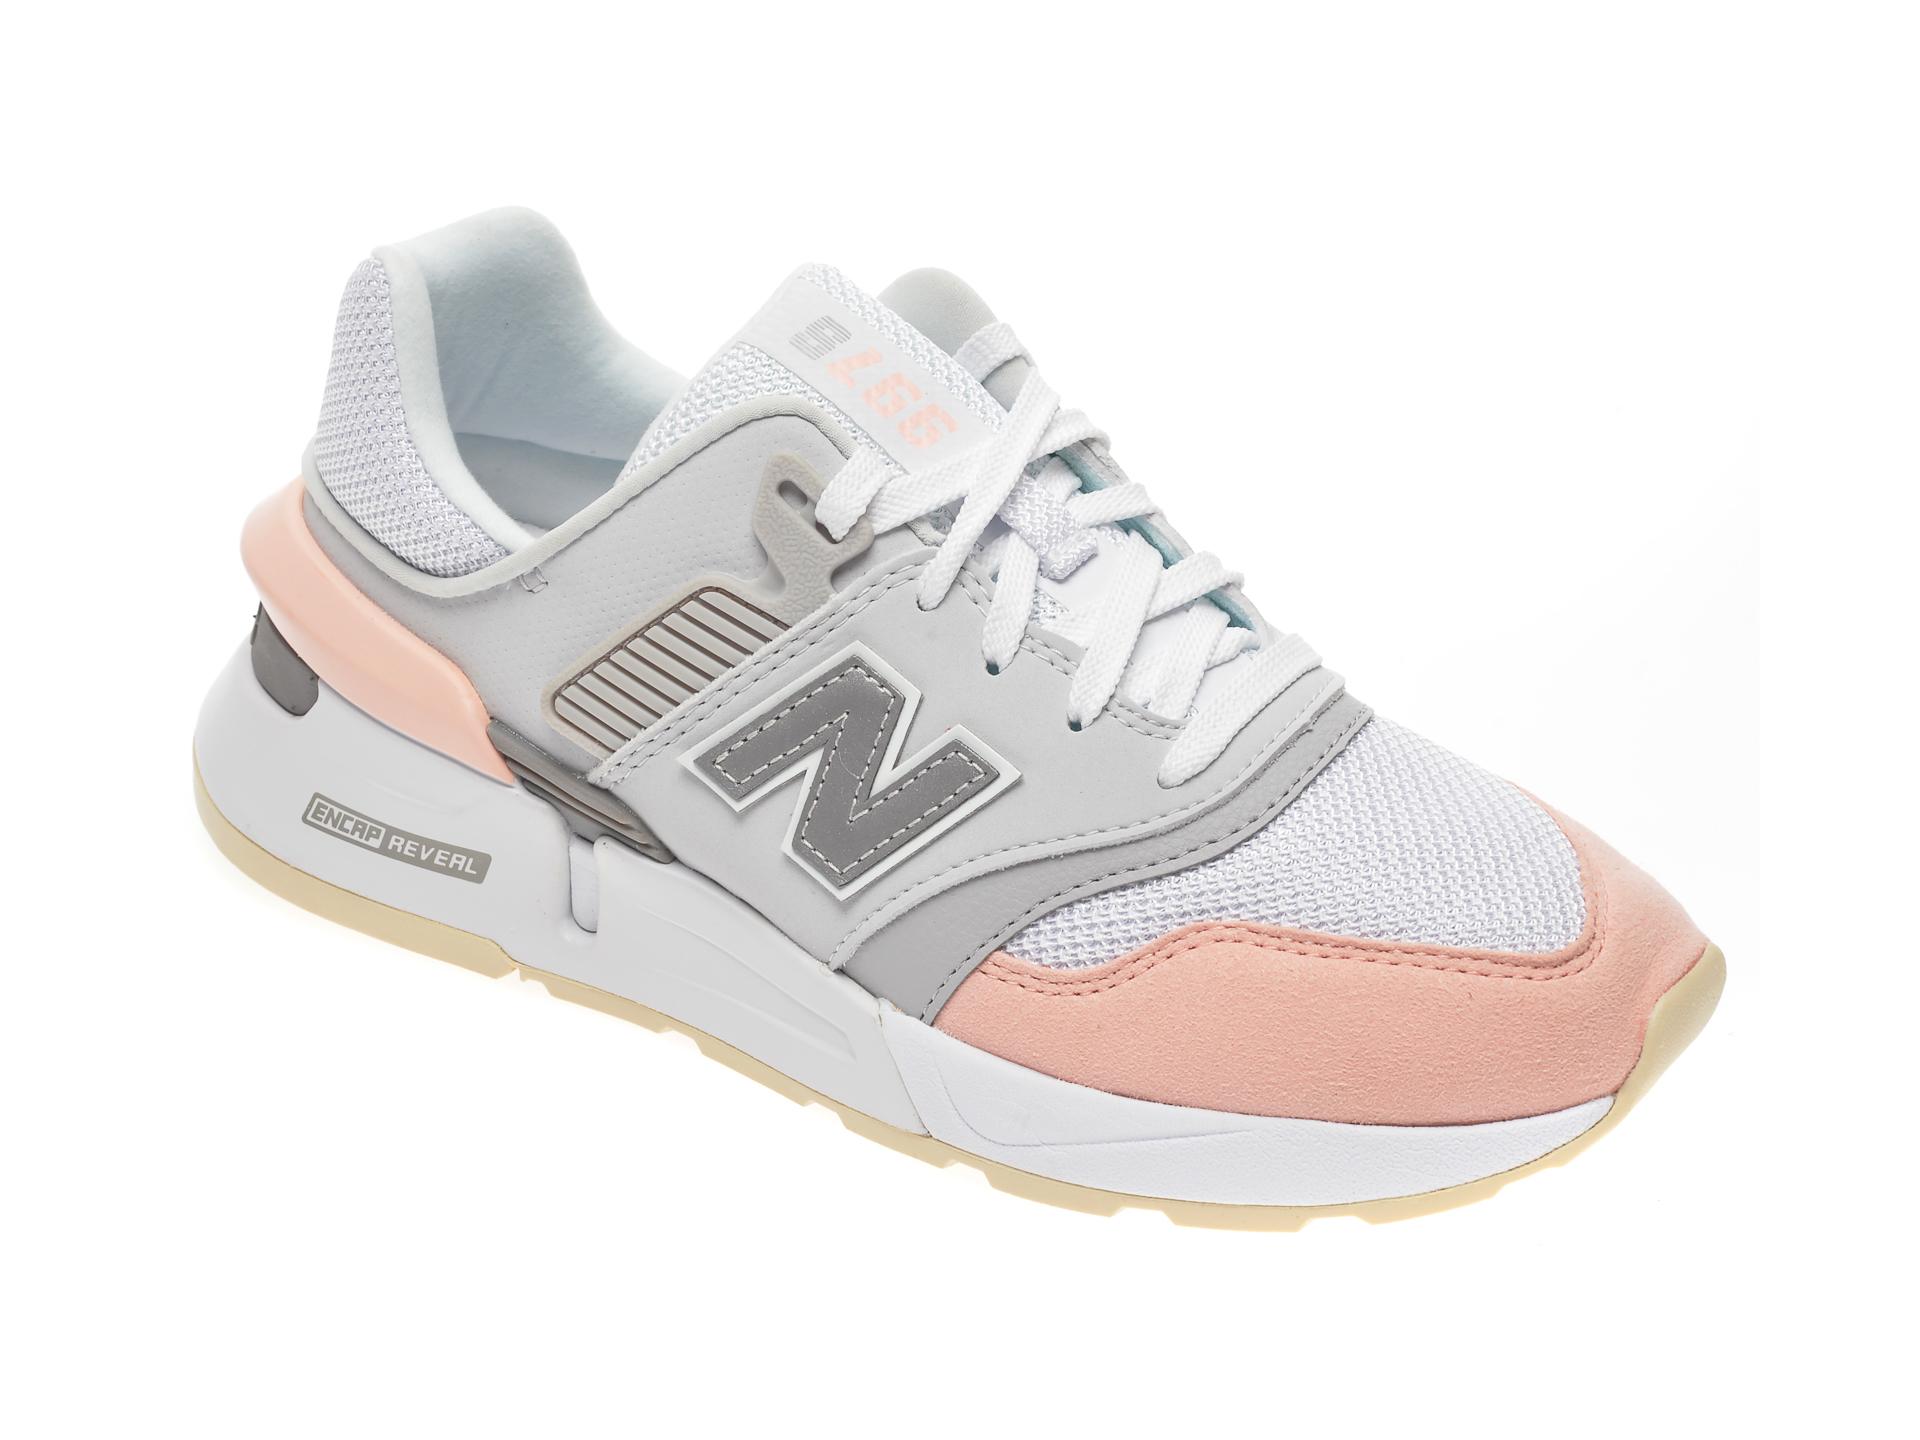 Pantofi sport NEW BALANCE albi, WS997, din material textil si piele ecologica